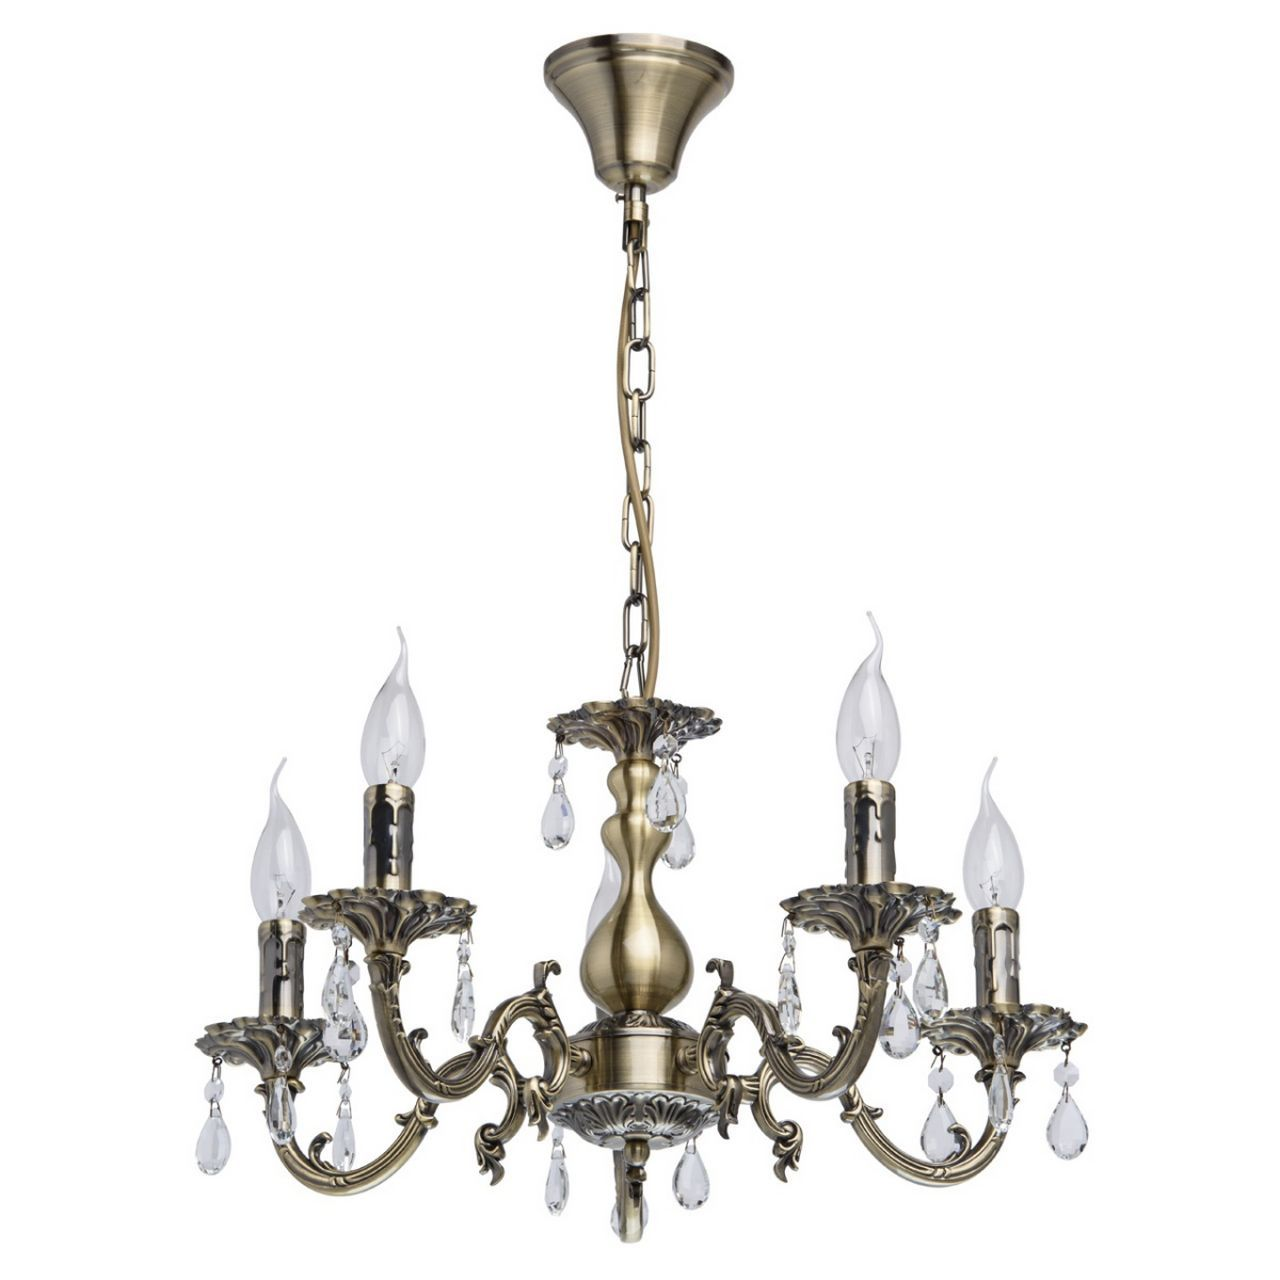 lustre baroque m tal laiton antique pampilles effet. Black Bedroom Furniture Sets. Home Design Ideas